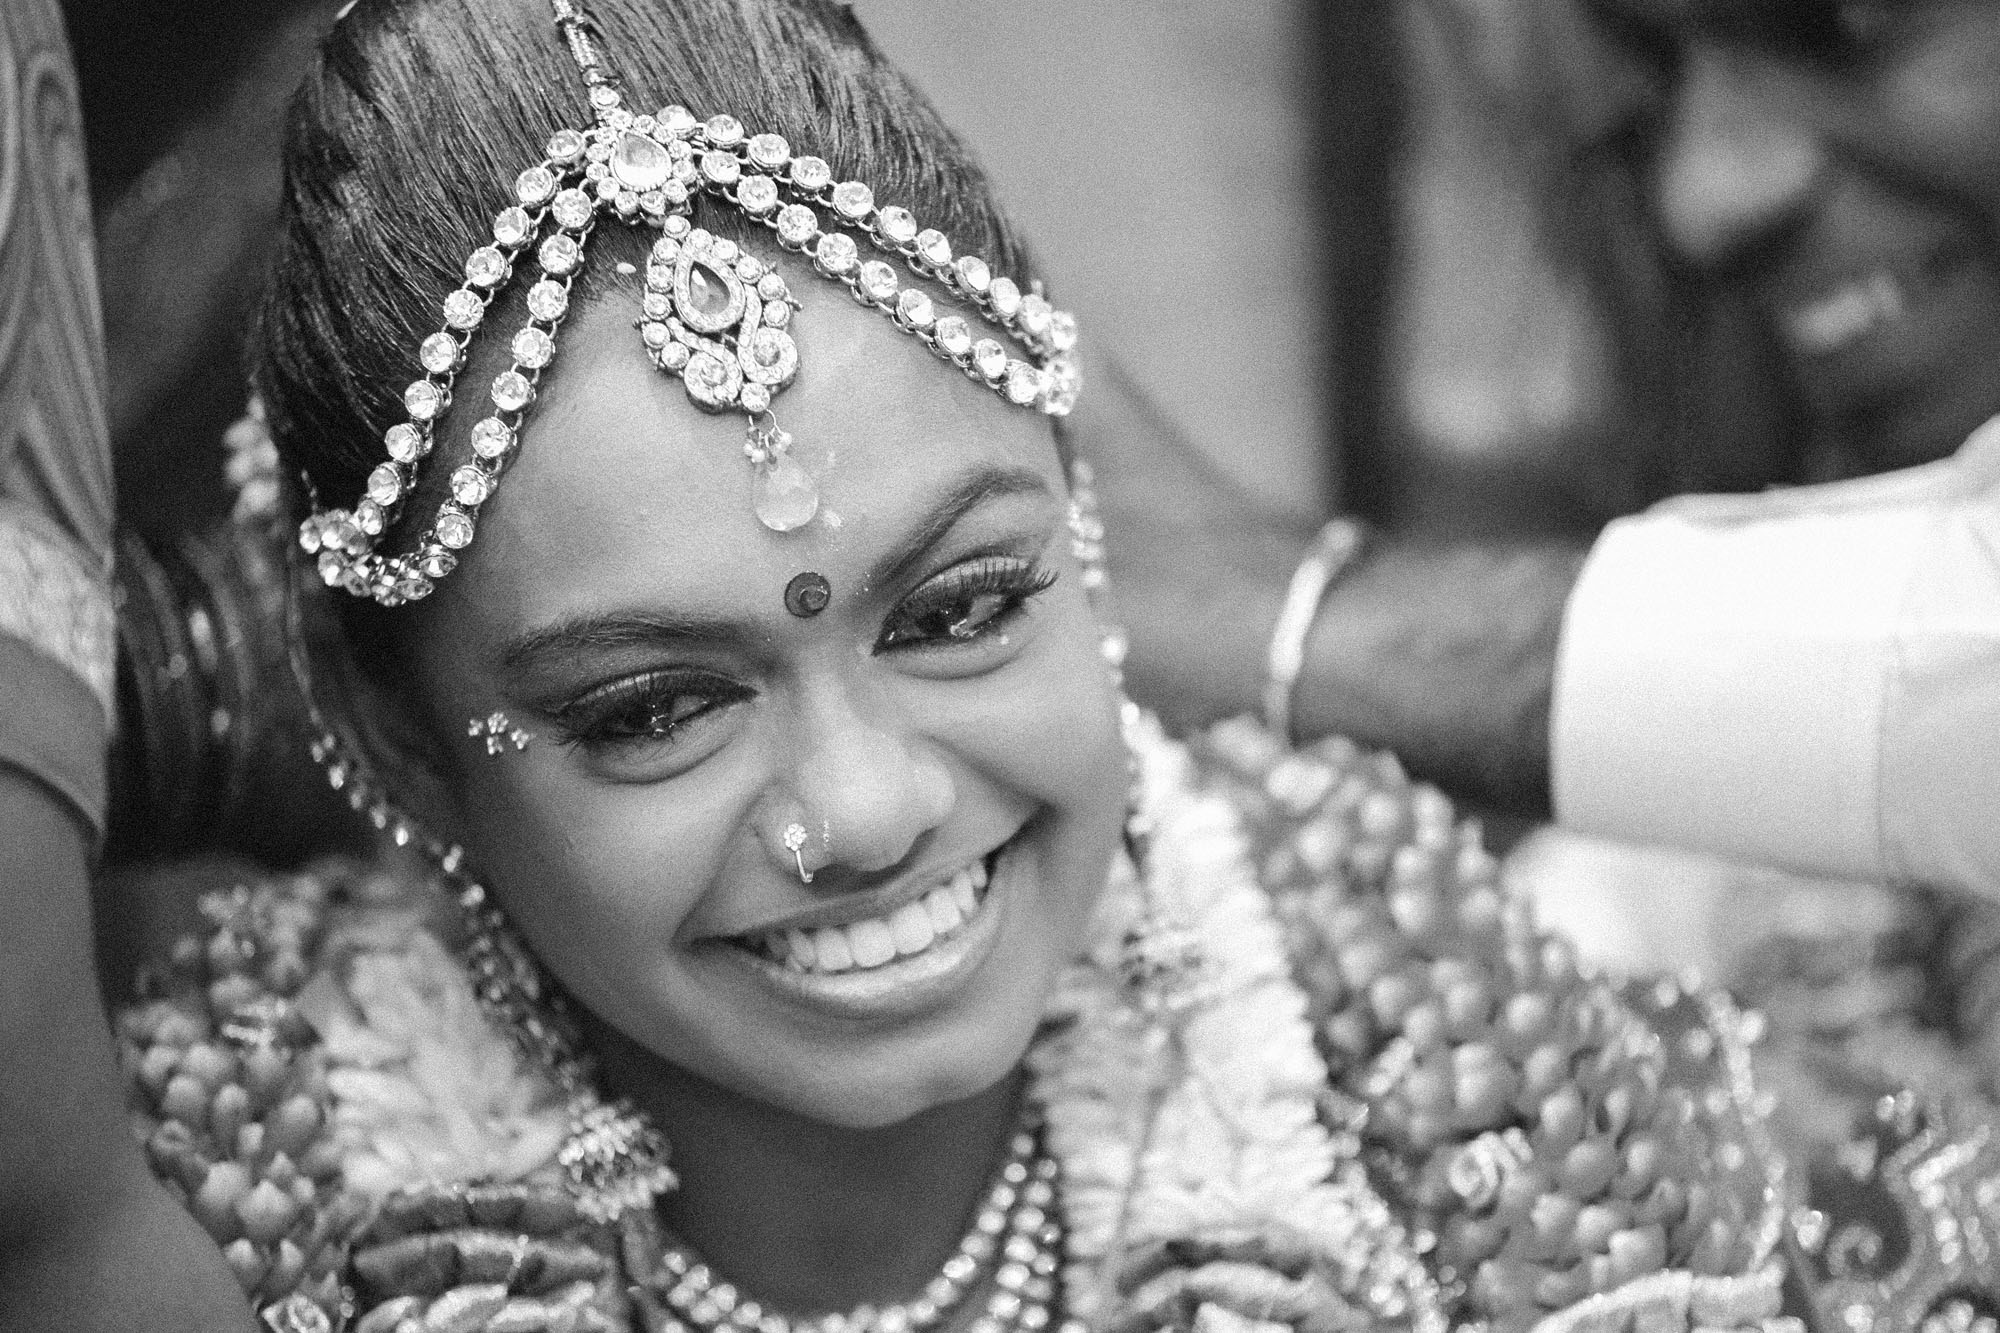 Amore_Production_Indian_Wedding_Photographer (2)